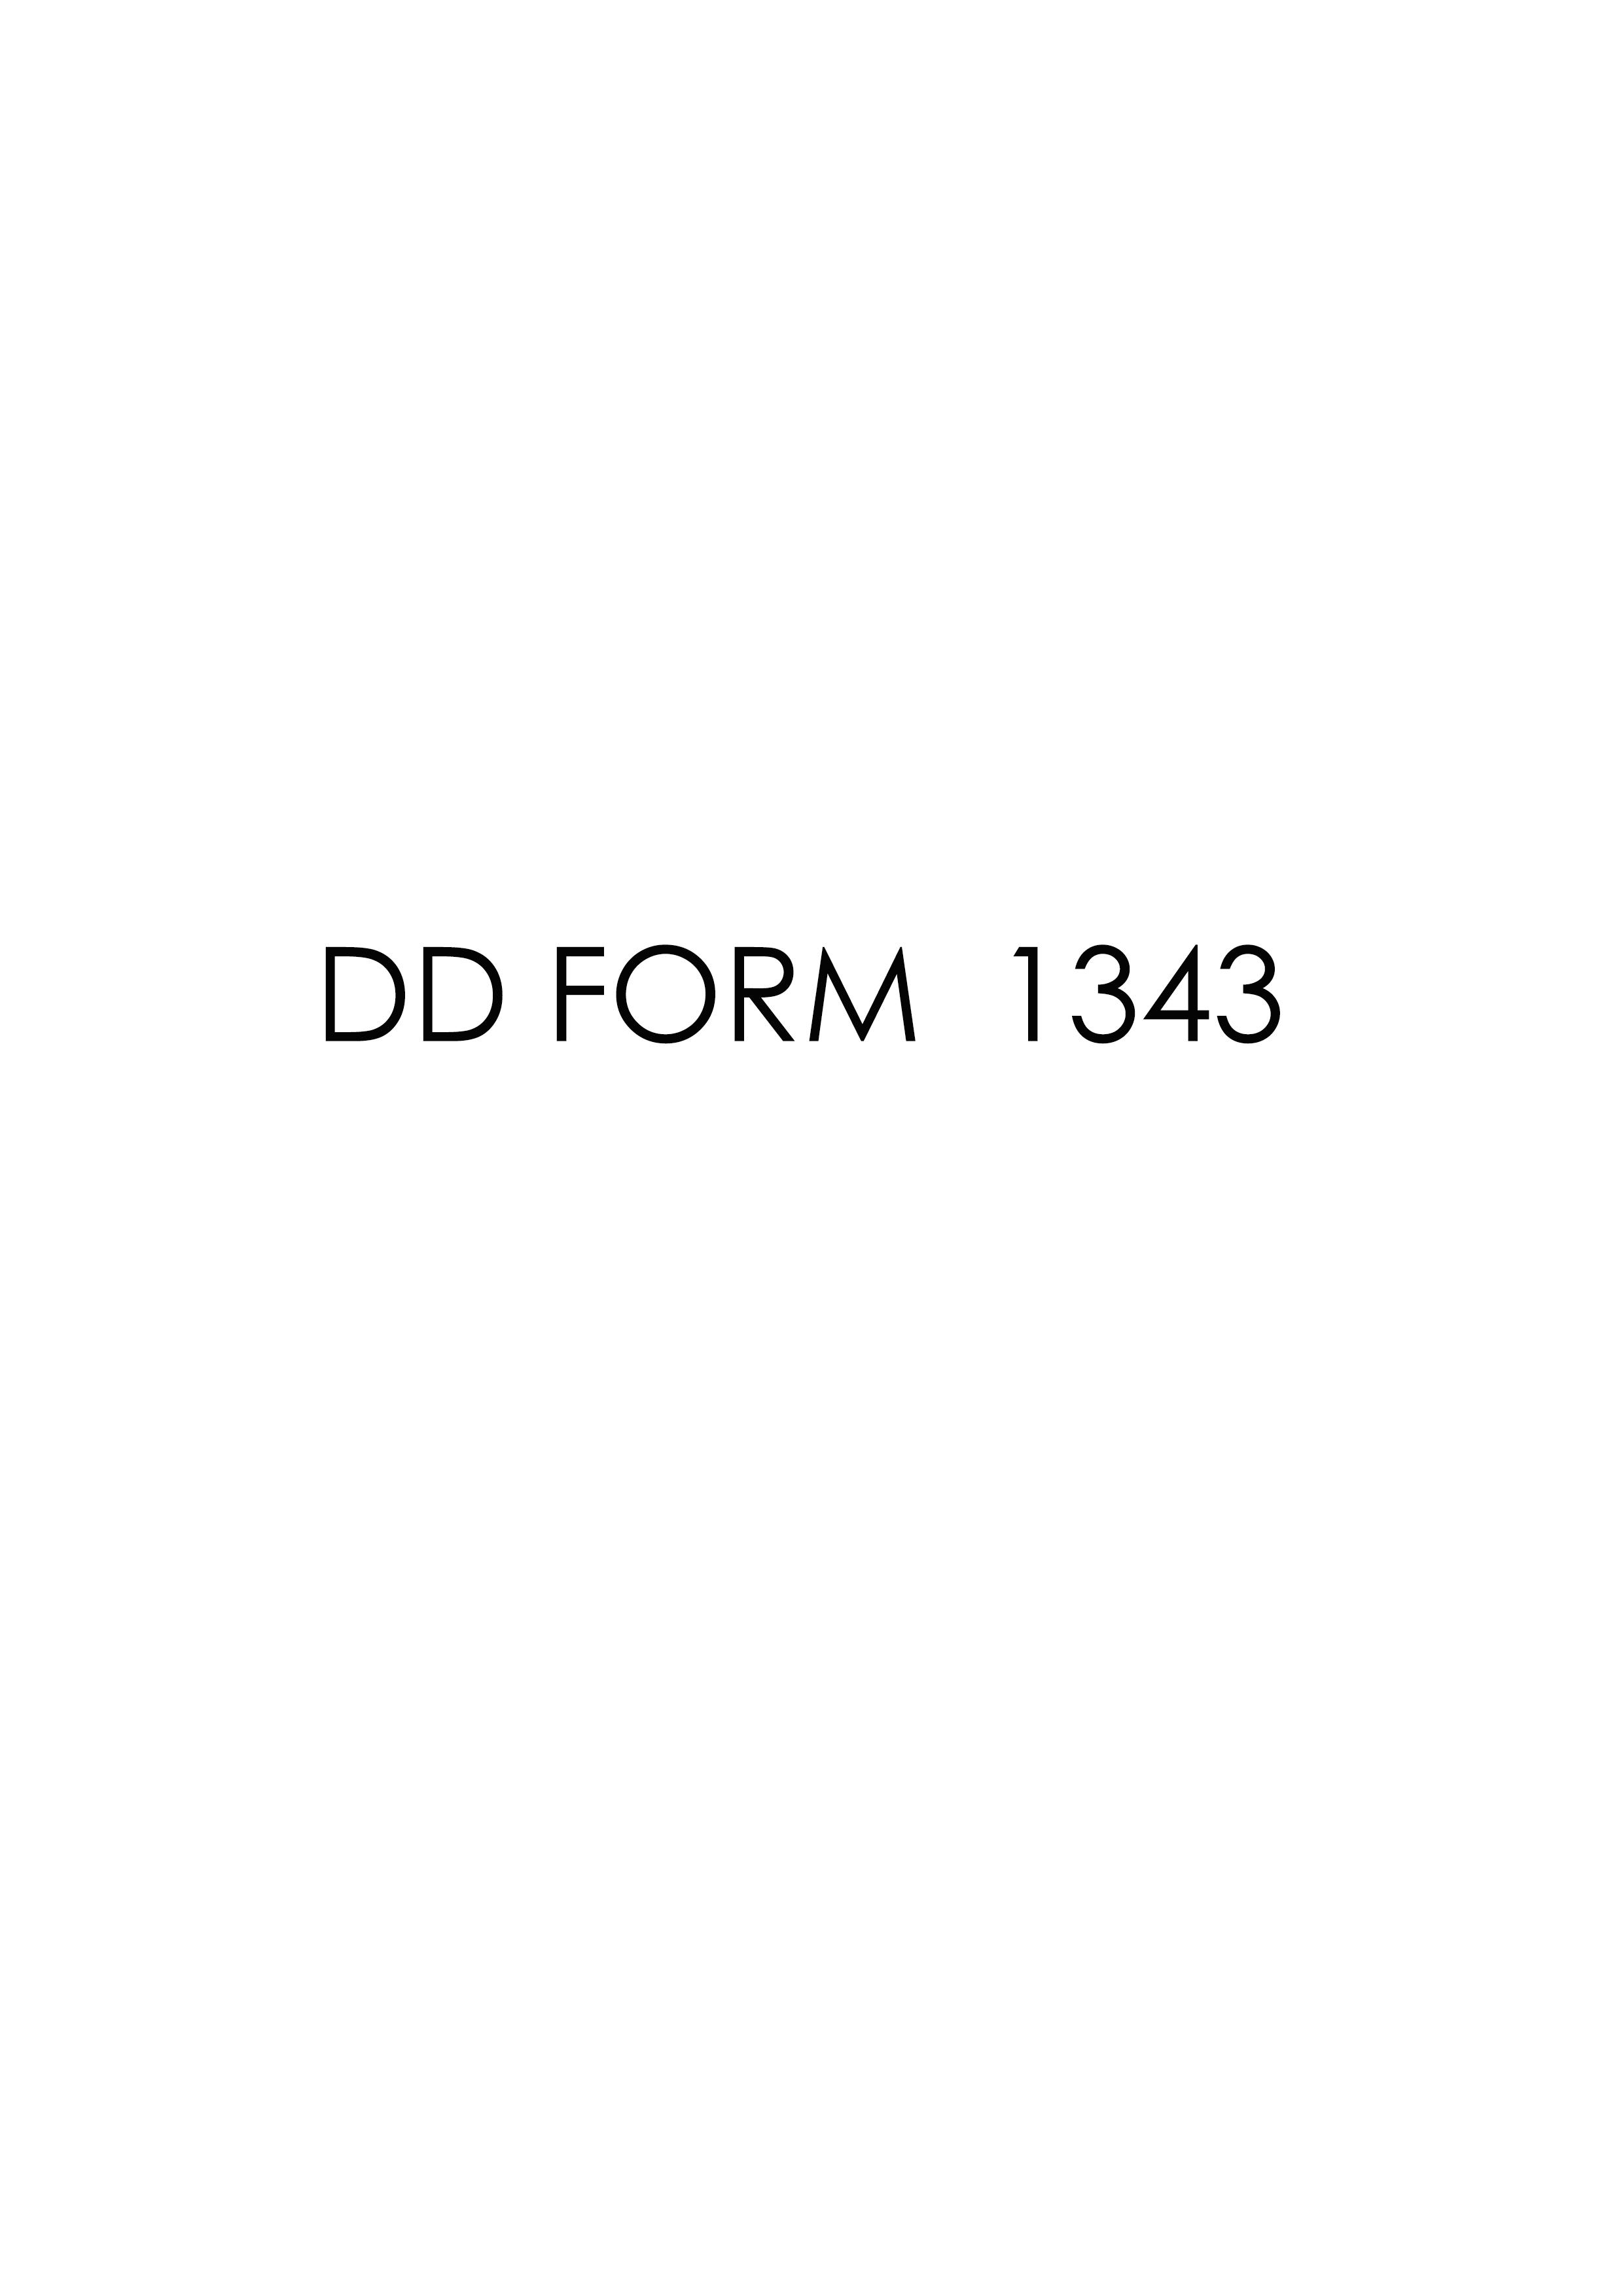 Download dd Form 1343 Free